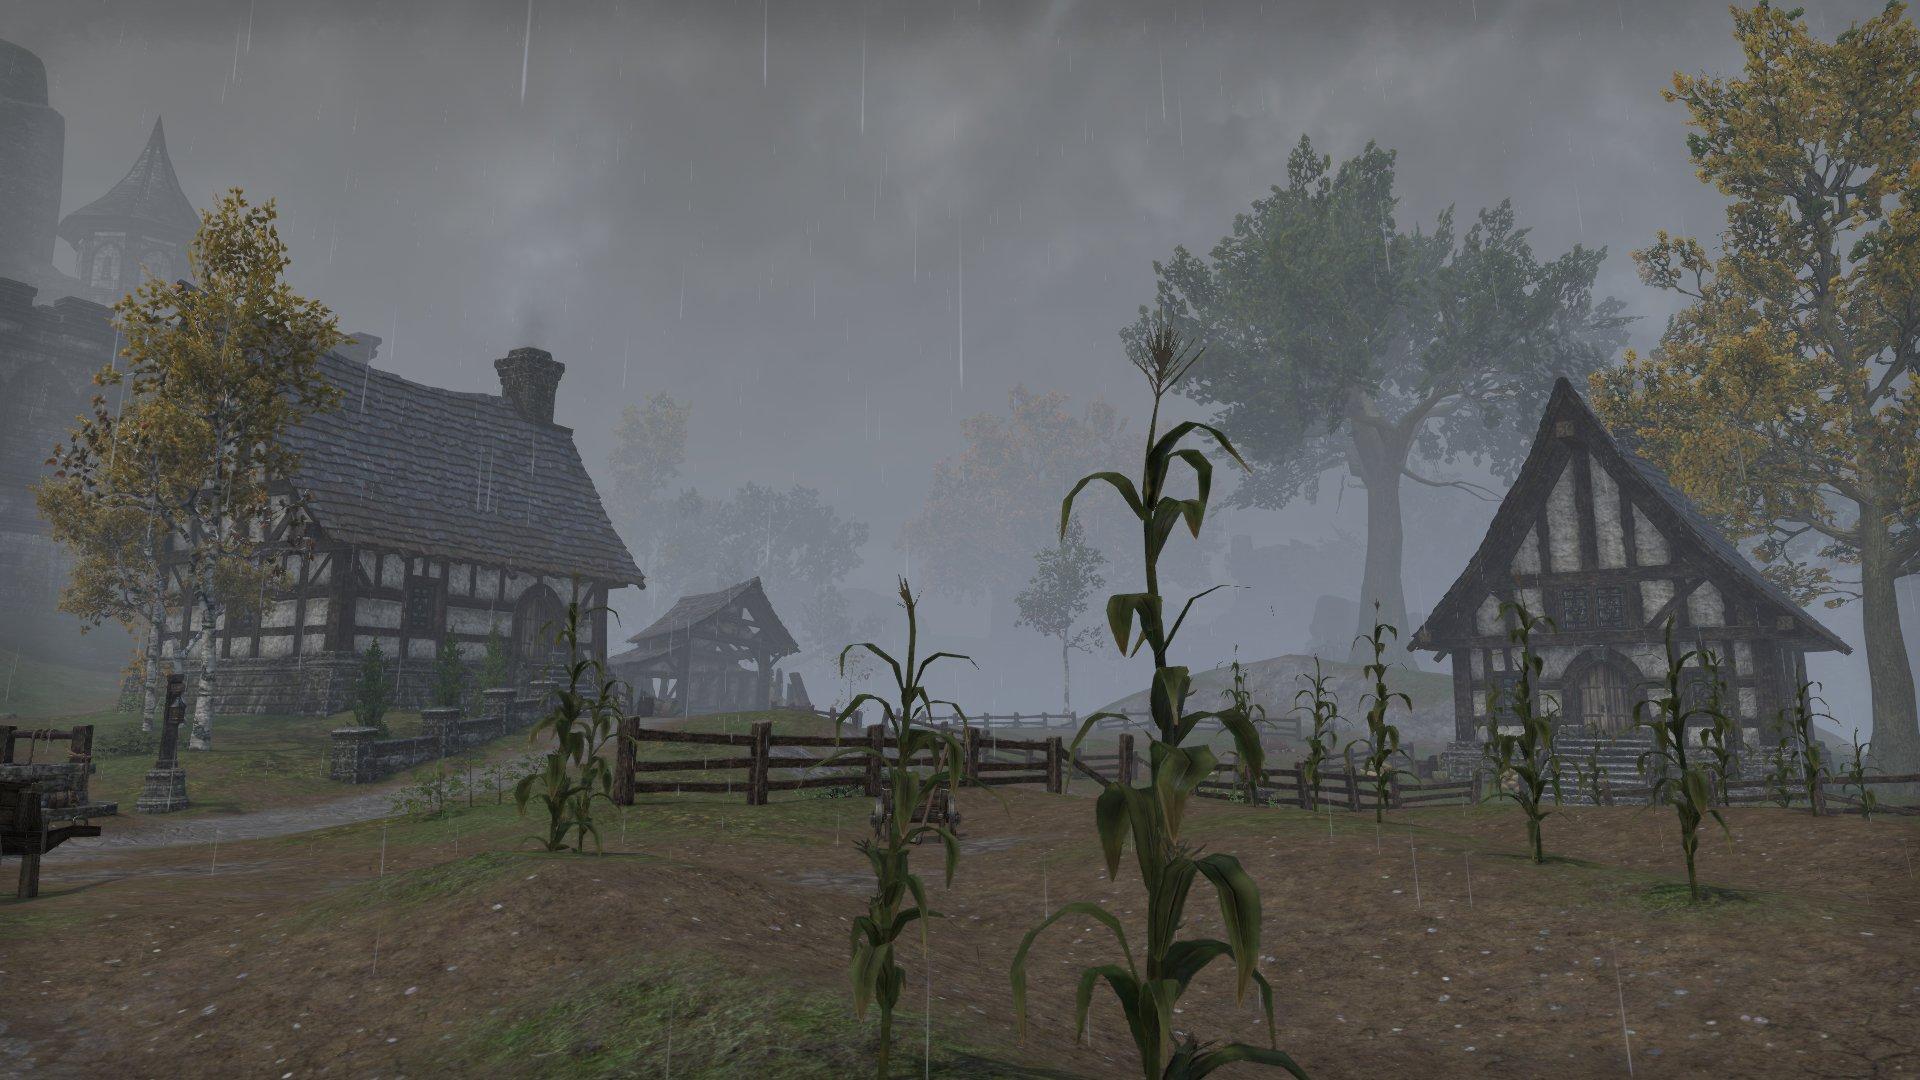 Gaudet Farm